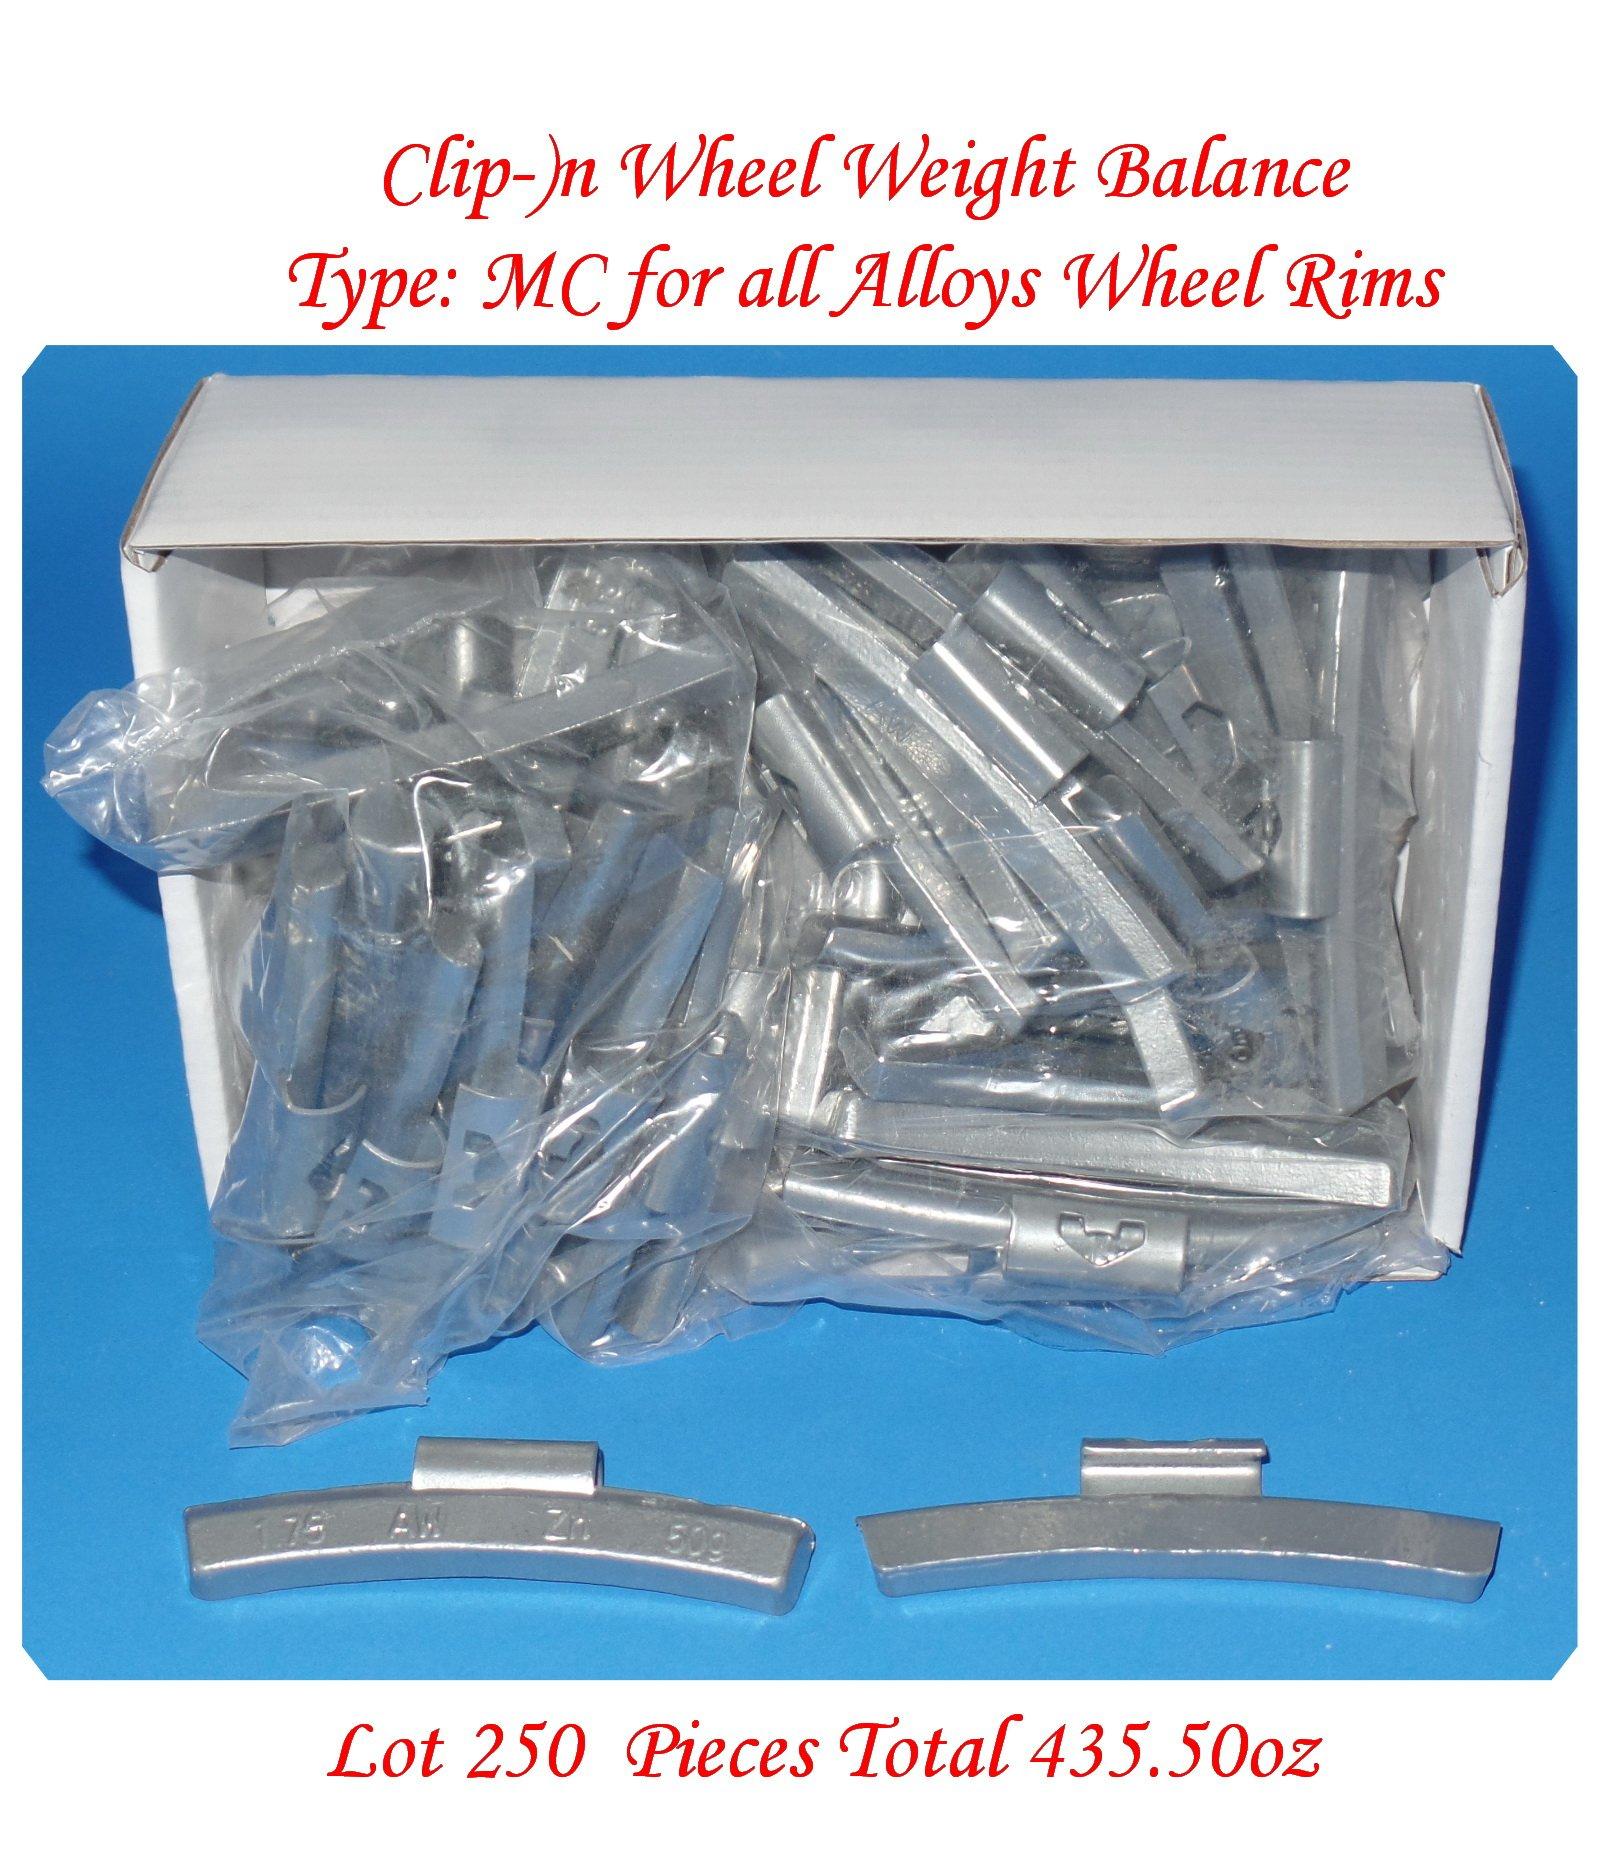 (250 Pcs) ZN CLIP-ON WHEEL WEIGHT BALANCE MC STYLE FOR ALLO WHEELS 1.75oz 1-3/4oz Total 437.50 oz